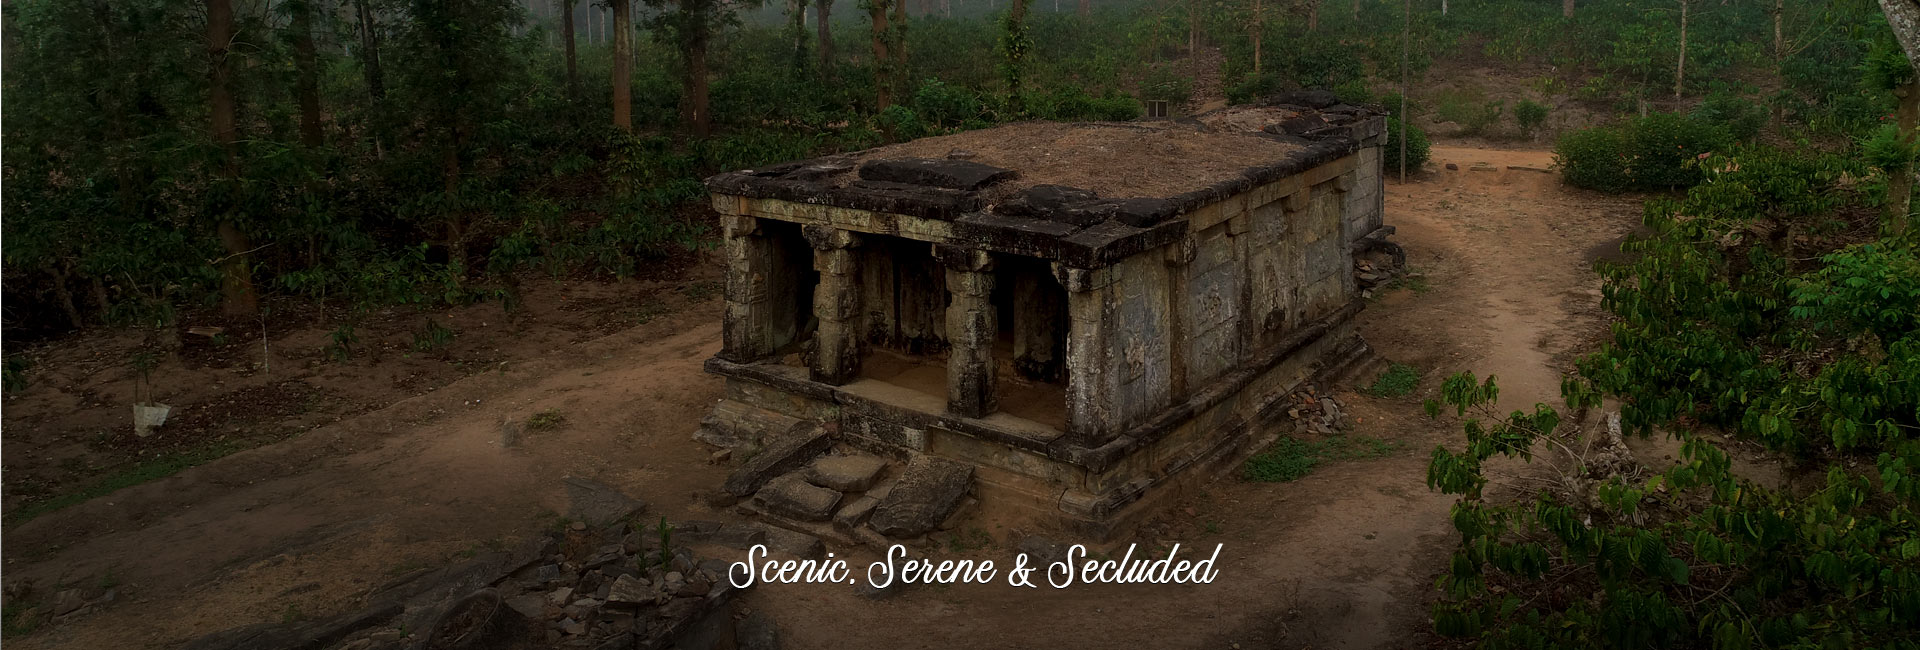 Scenic, Serene & Secluded